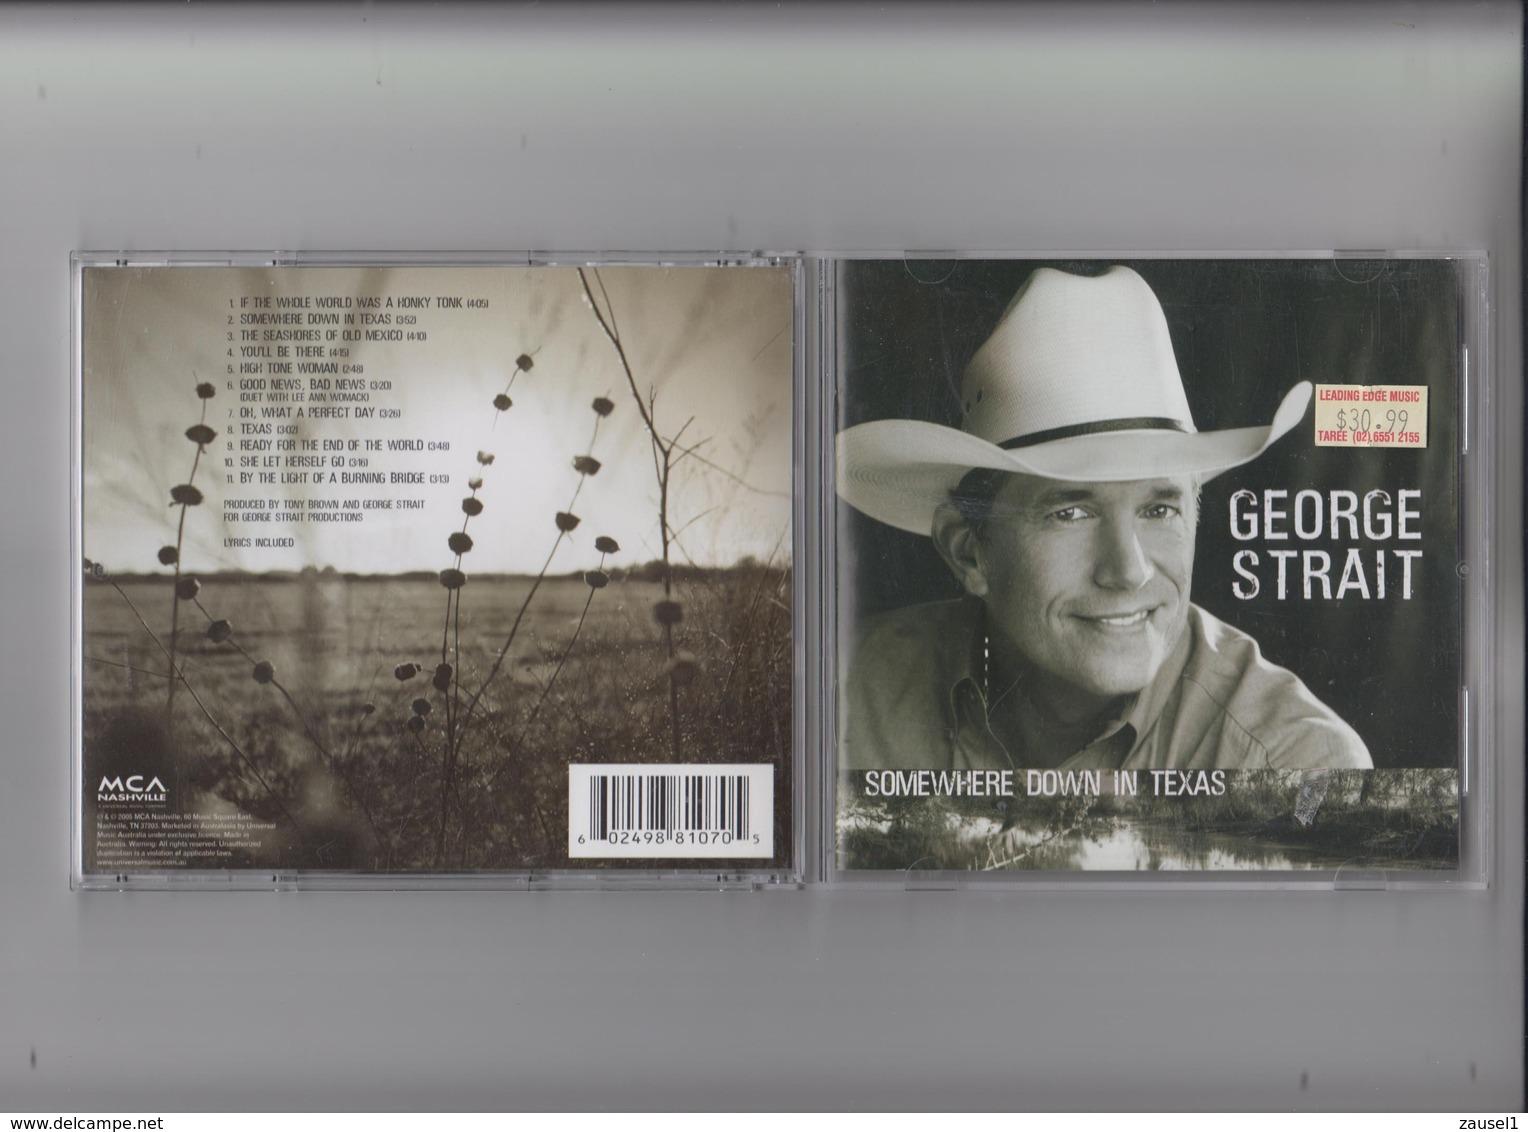 George Strait - Somewhere Down In Texas - Original CD - Country & Folk